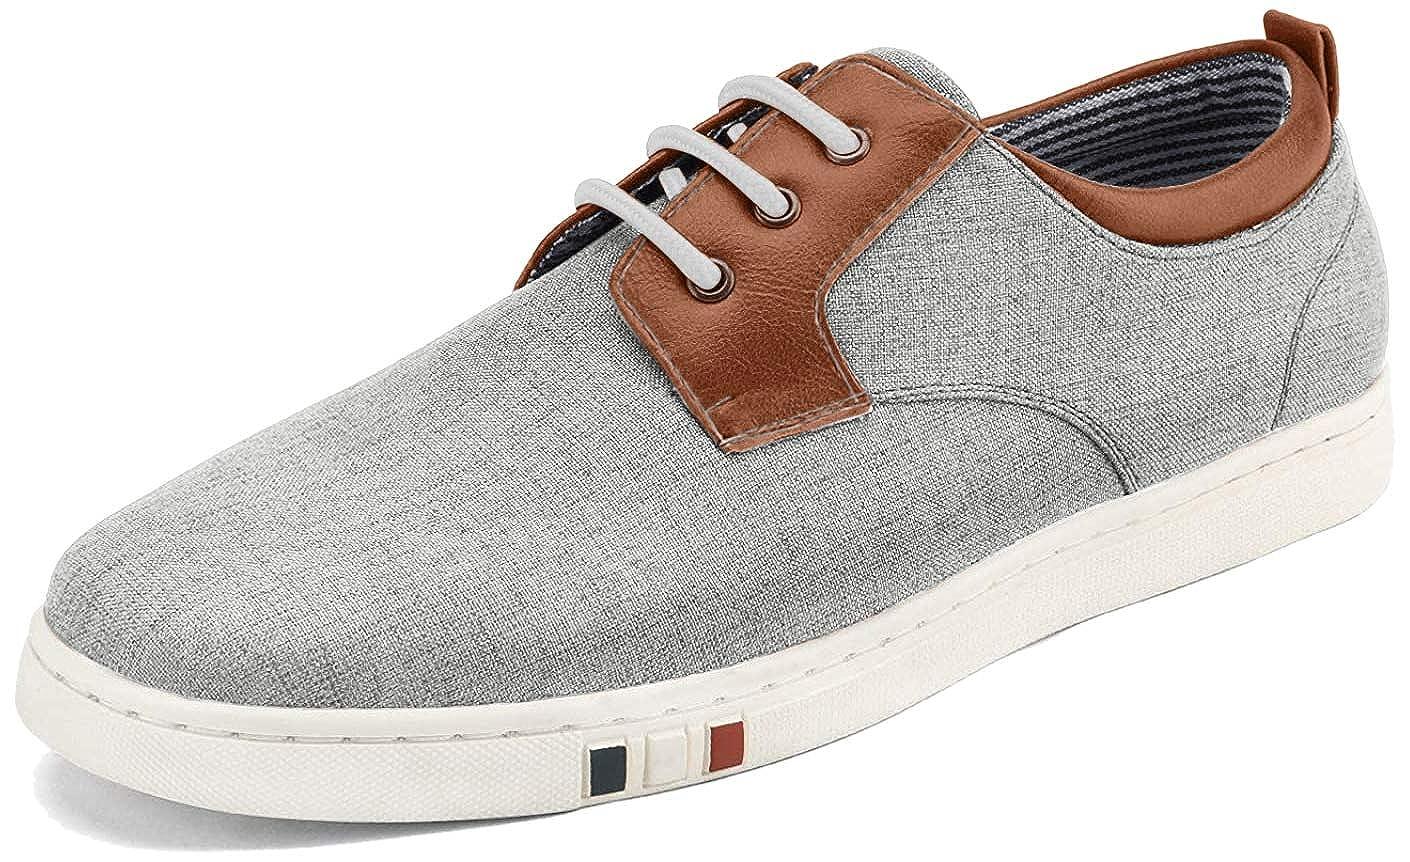 Buy Bruno Marc Men's Oxfords Shoes